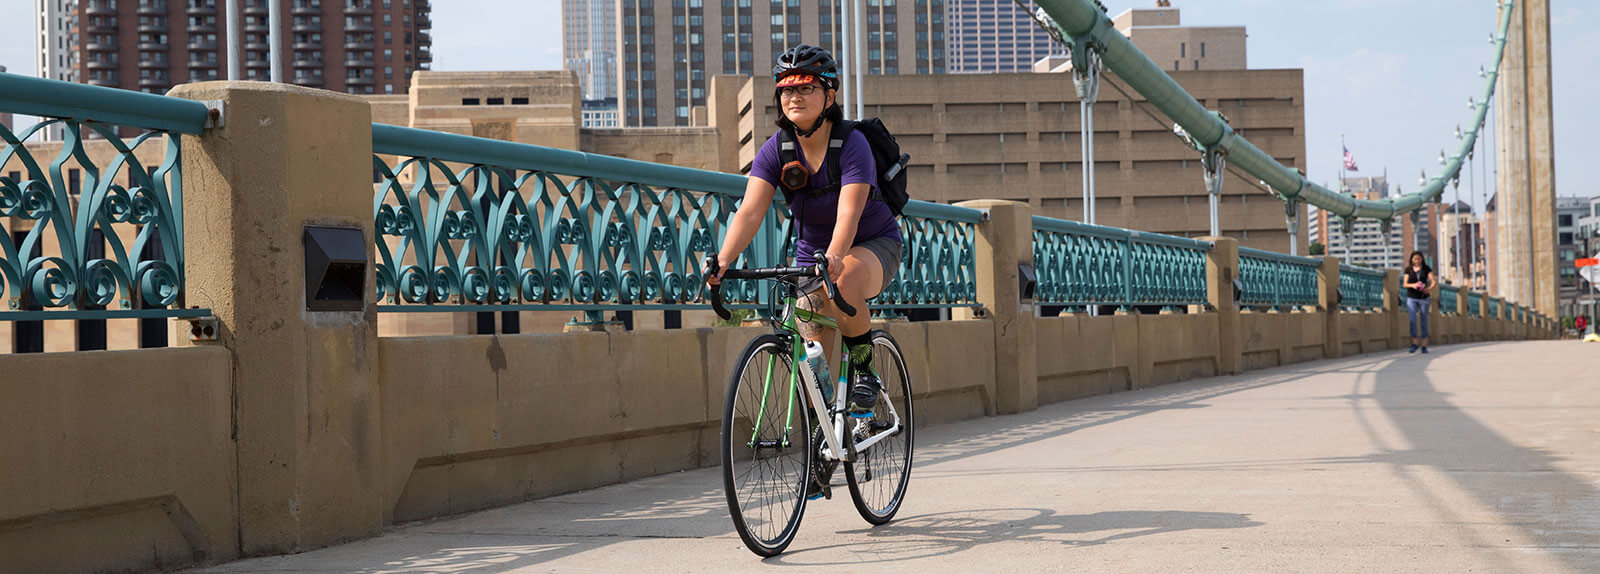 Person rides green All-City Mr. Pink bike across outdoor bridge